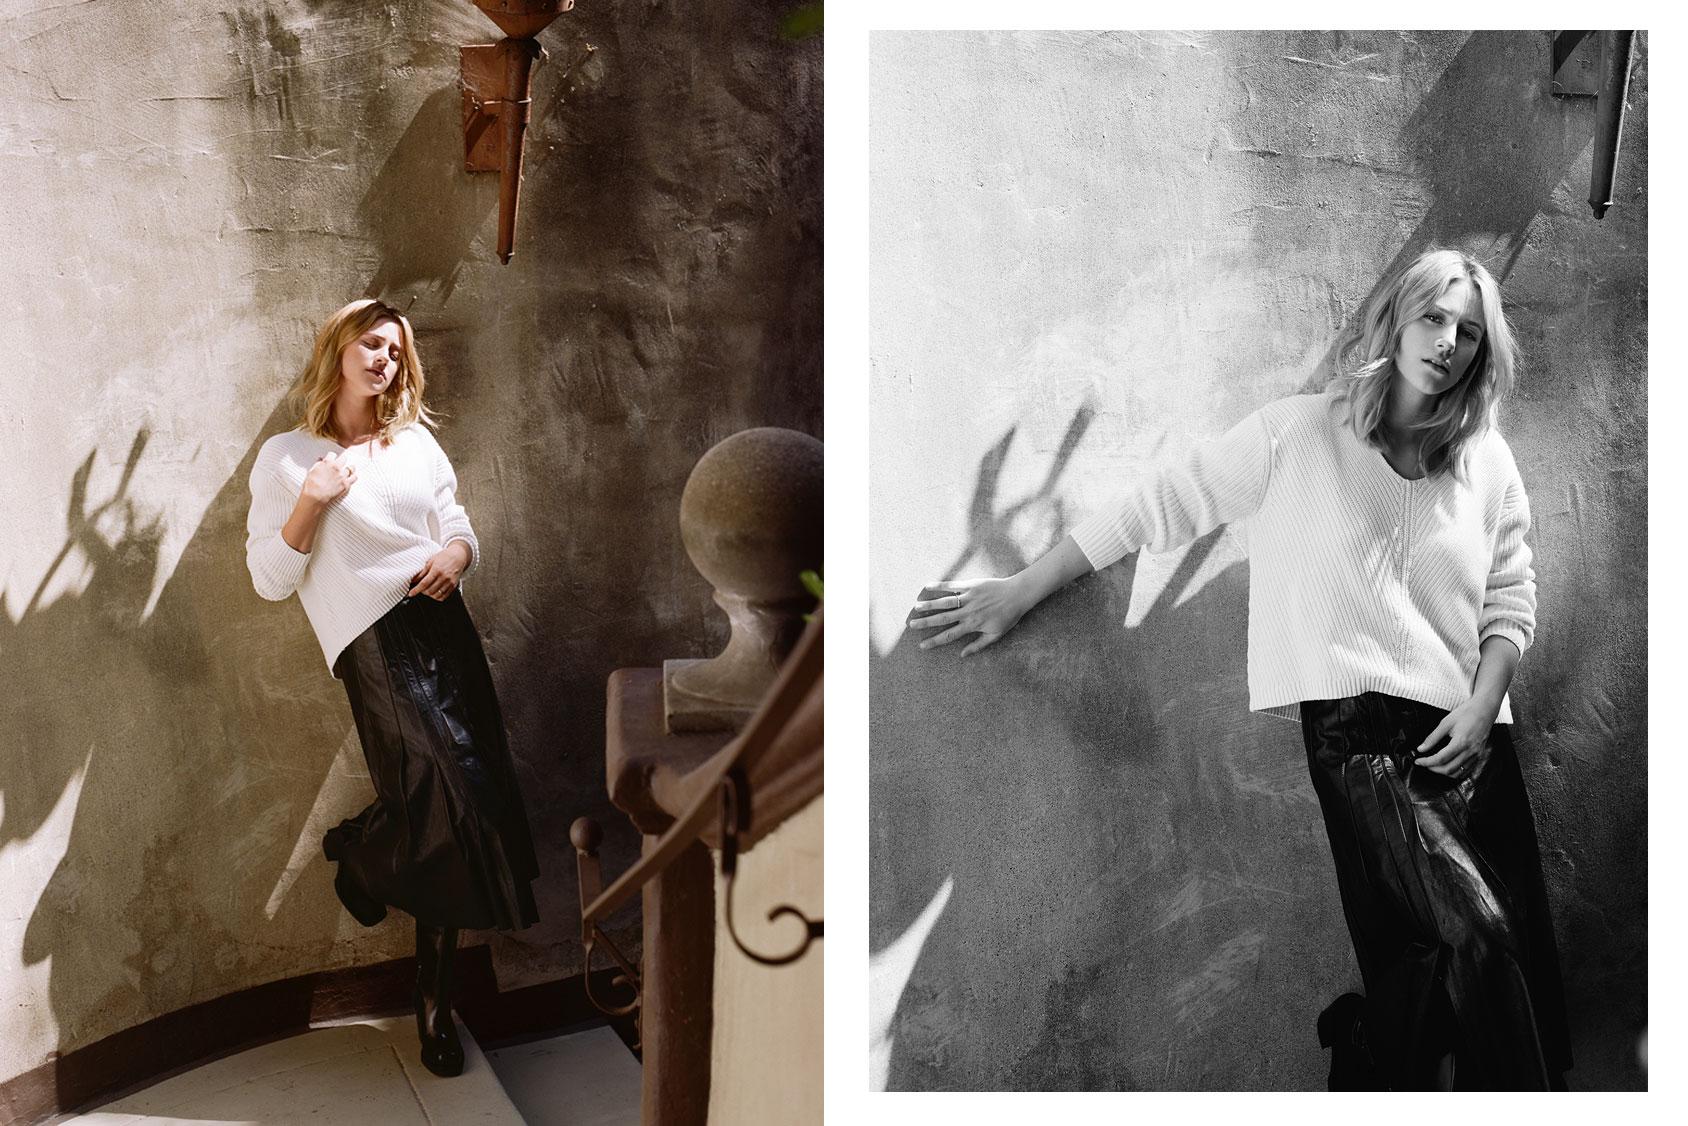 H&M Studio AW18 Lili Reinhart